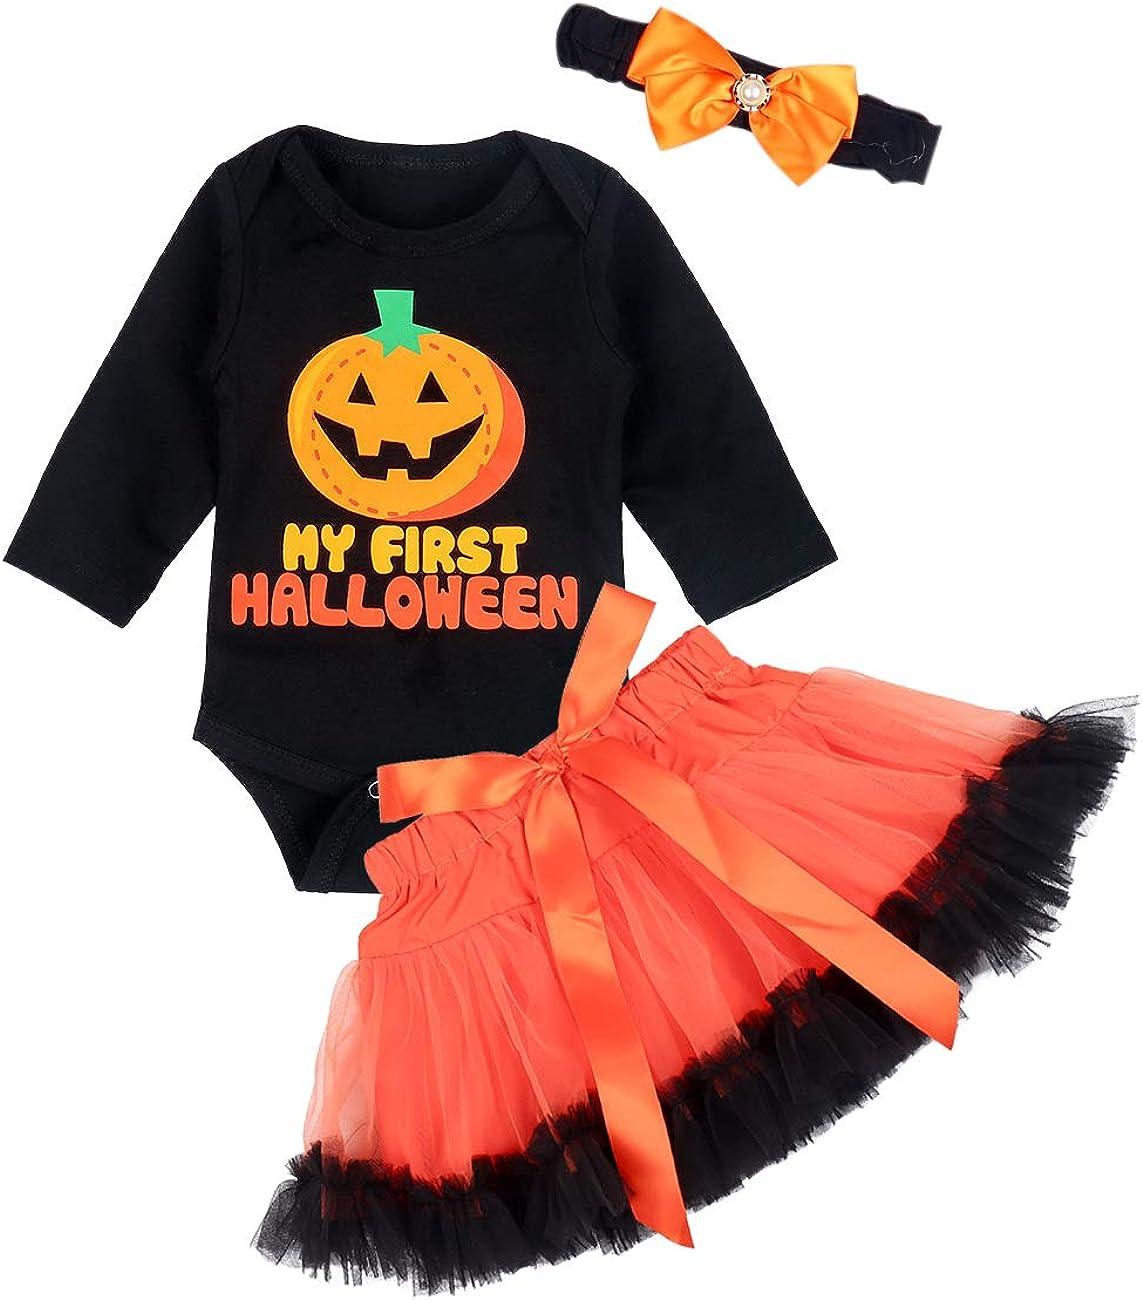 Leg Warmers with Headbands 4Pcs Dress Outfit Set. My First Halloween Newborn Baby Girls Clothes Romper Bow Tutu Short Skirt